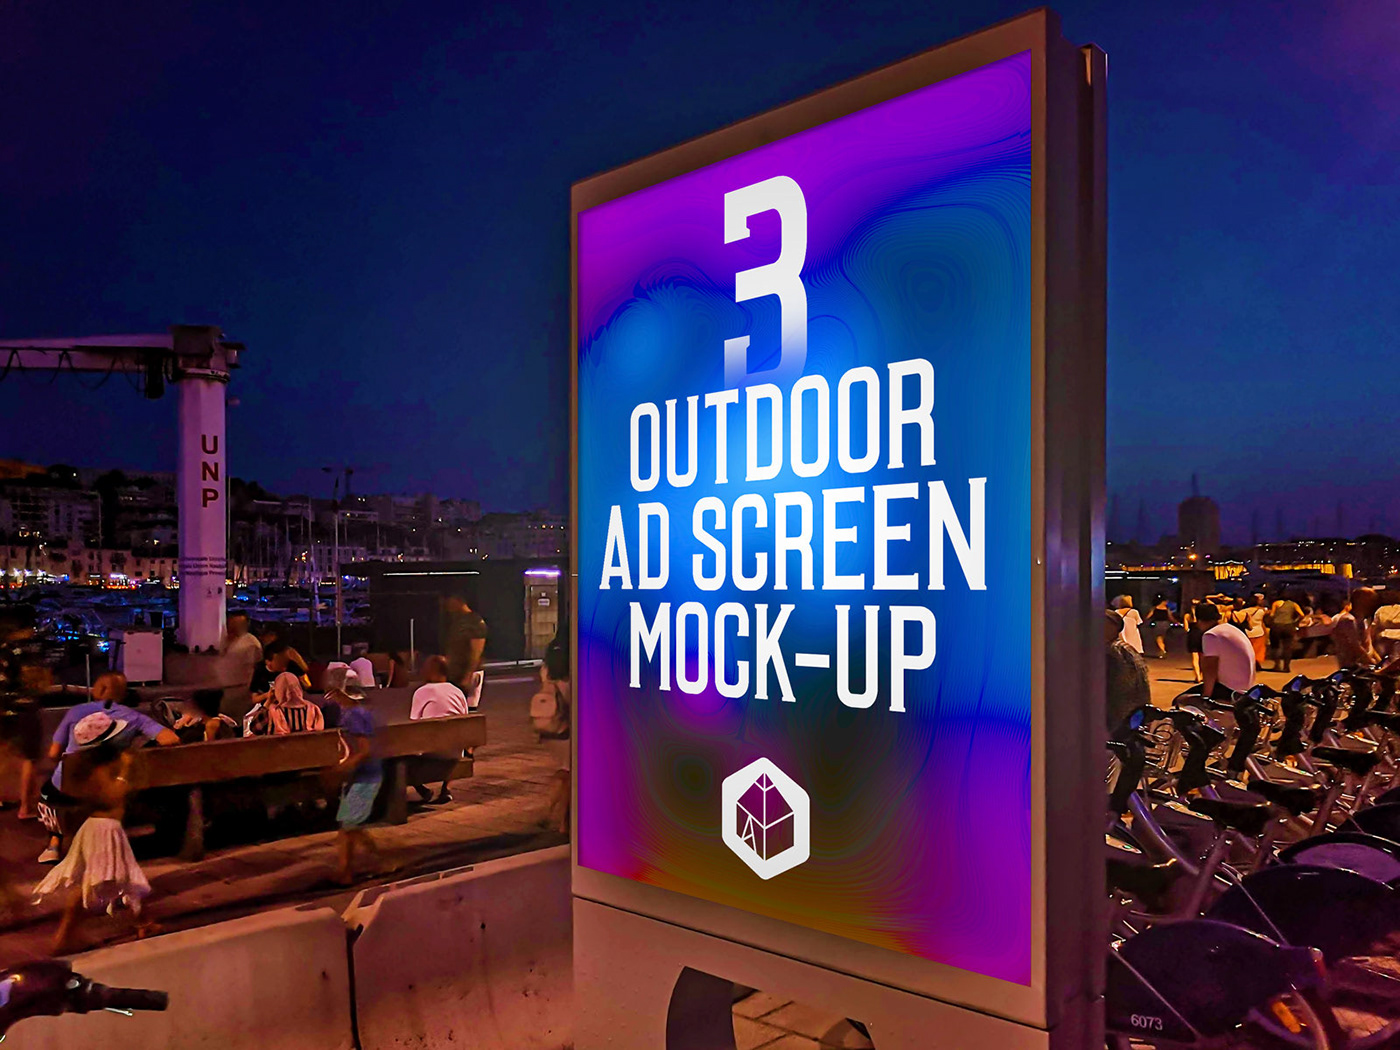 ad advertisement Advertising  Display mock-up Mockup Outdoor poster screen Street